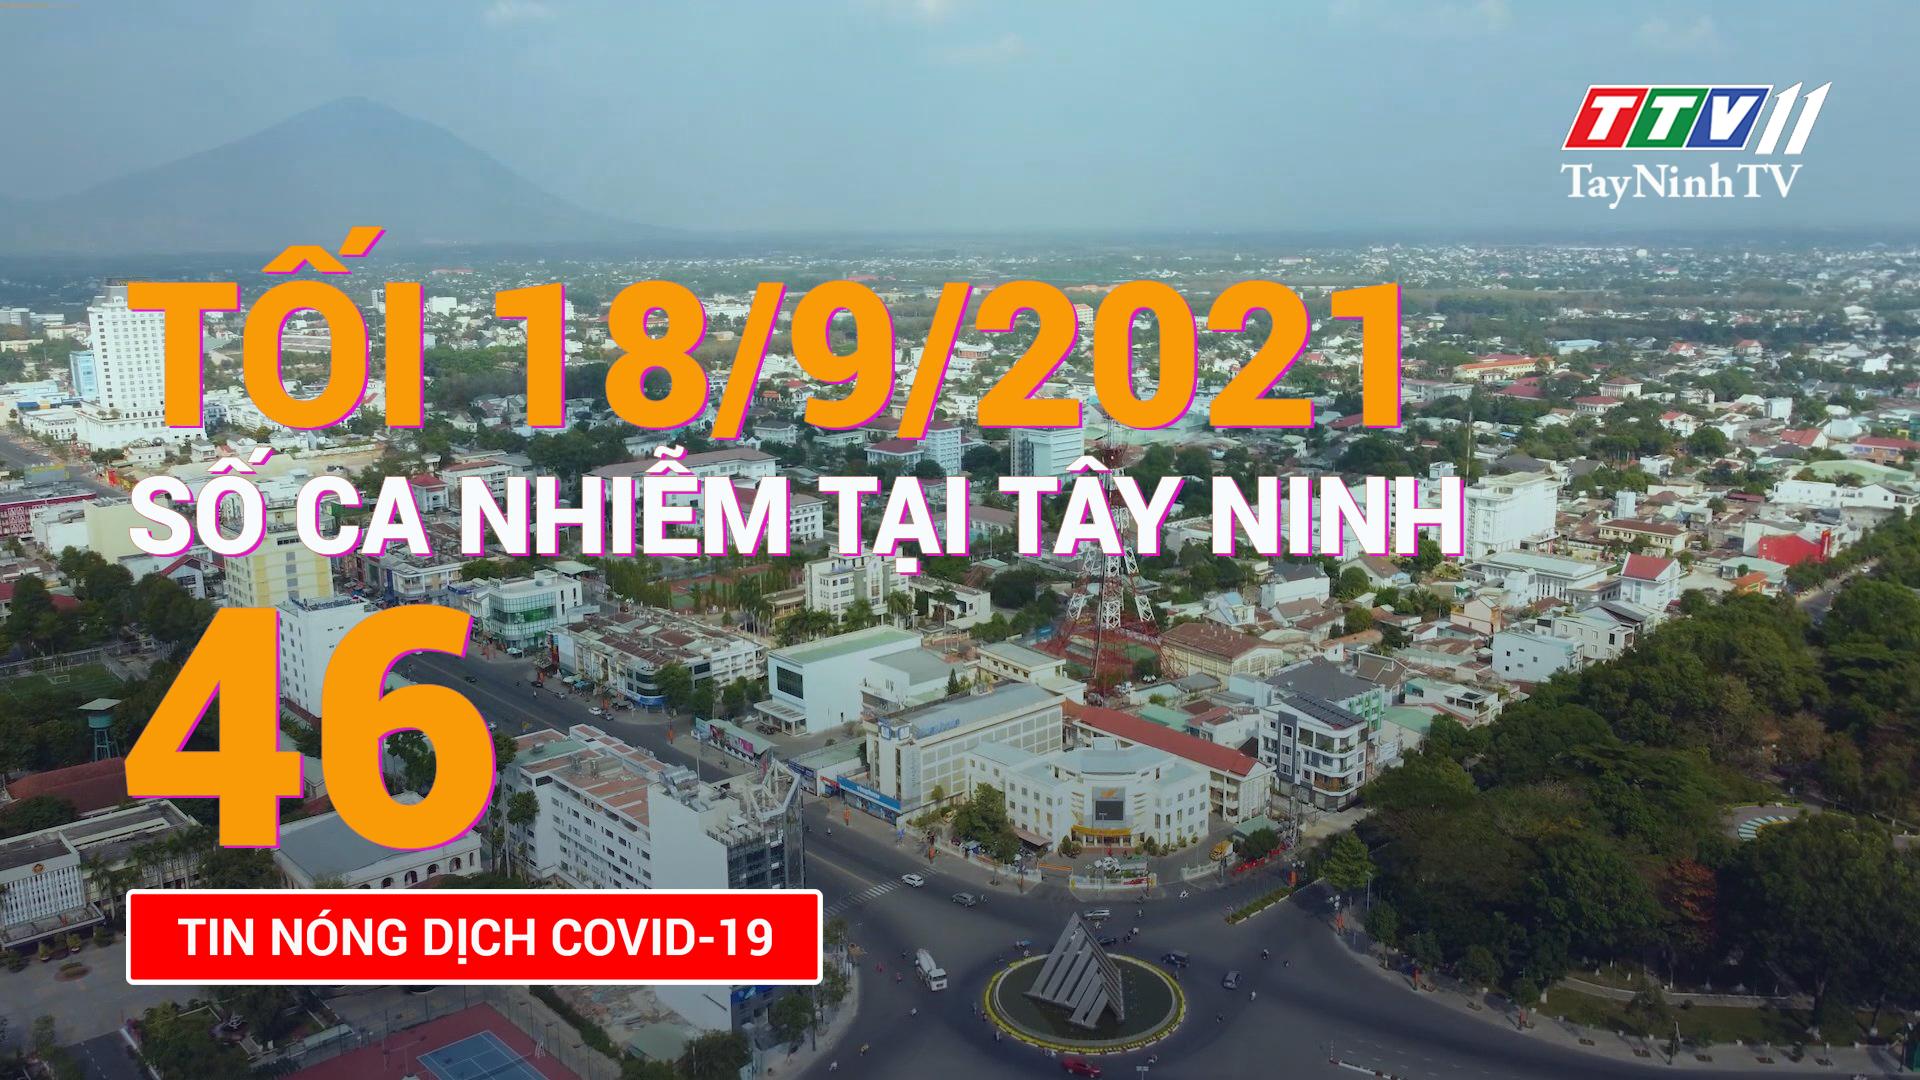 Tin tức Covid-19 tối 18/9/2021 | TayNinhTV